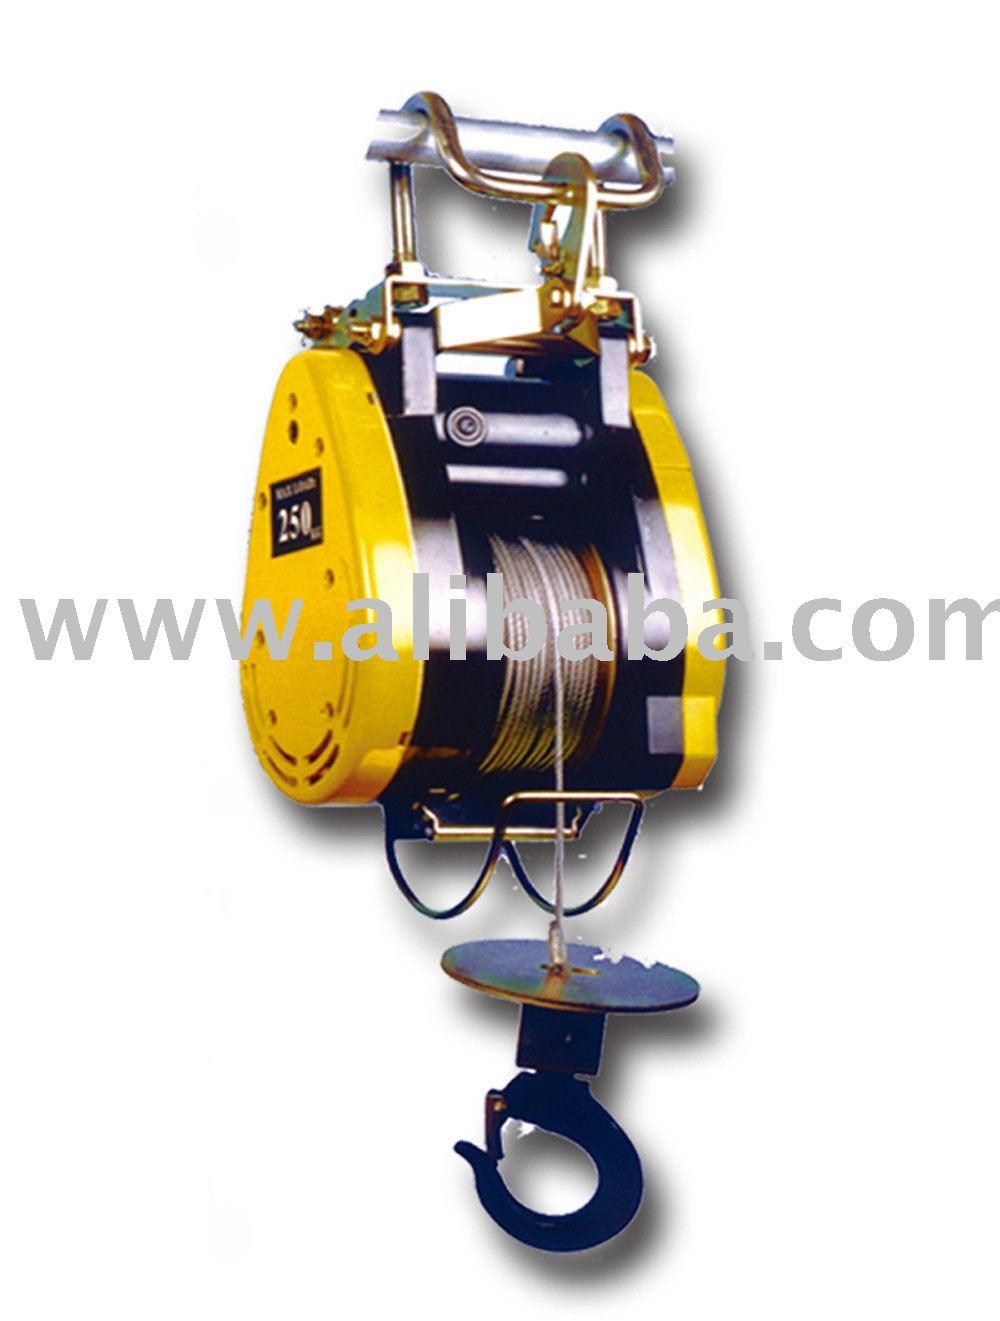 120 v ac portable electric hoist photo detailed about bth 250a 120